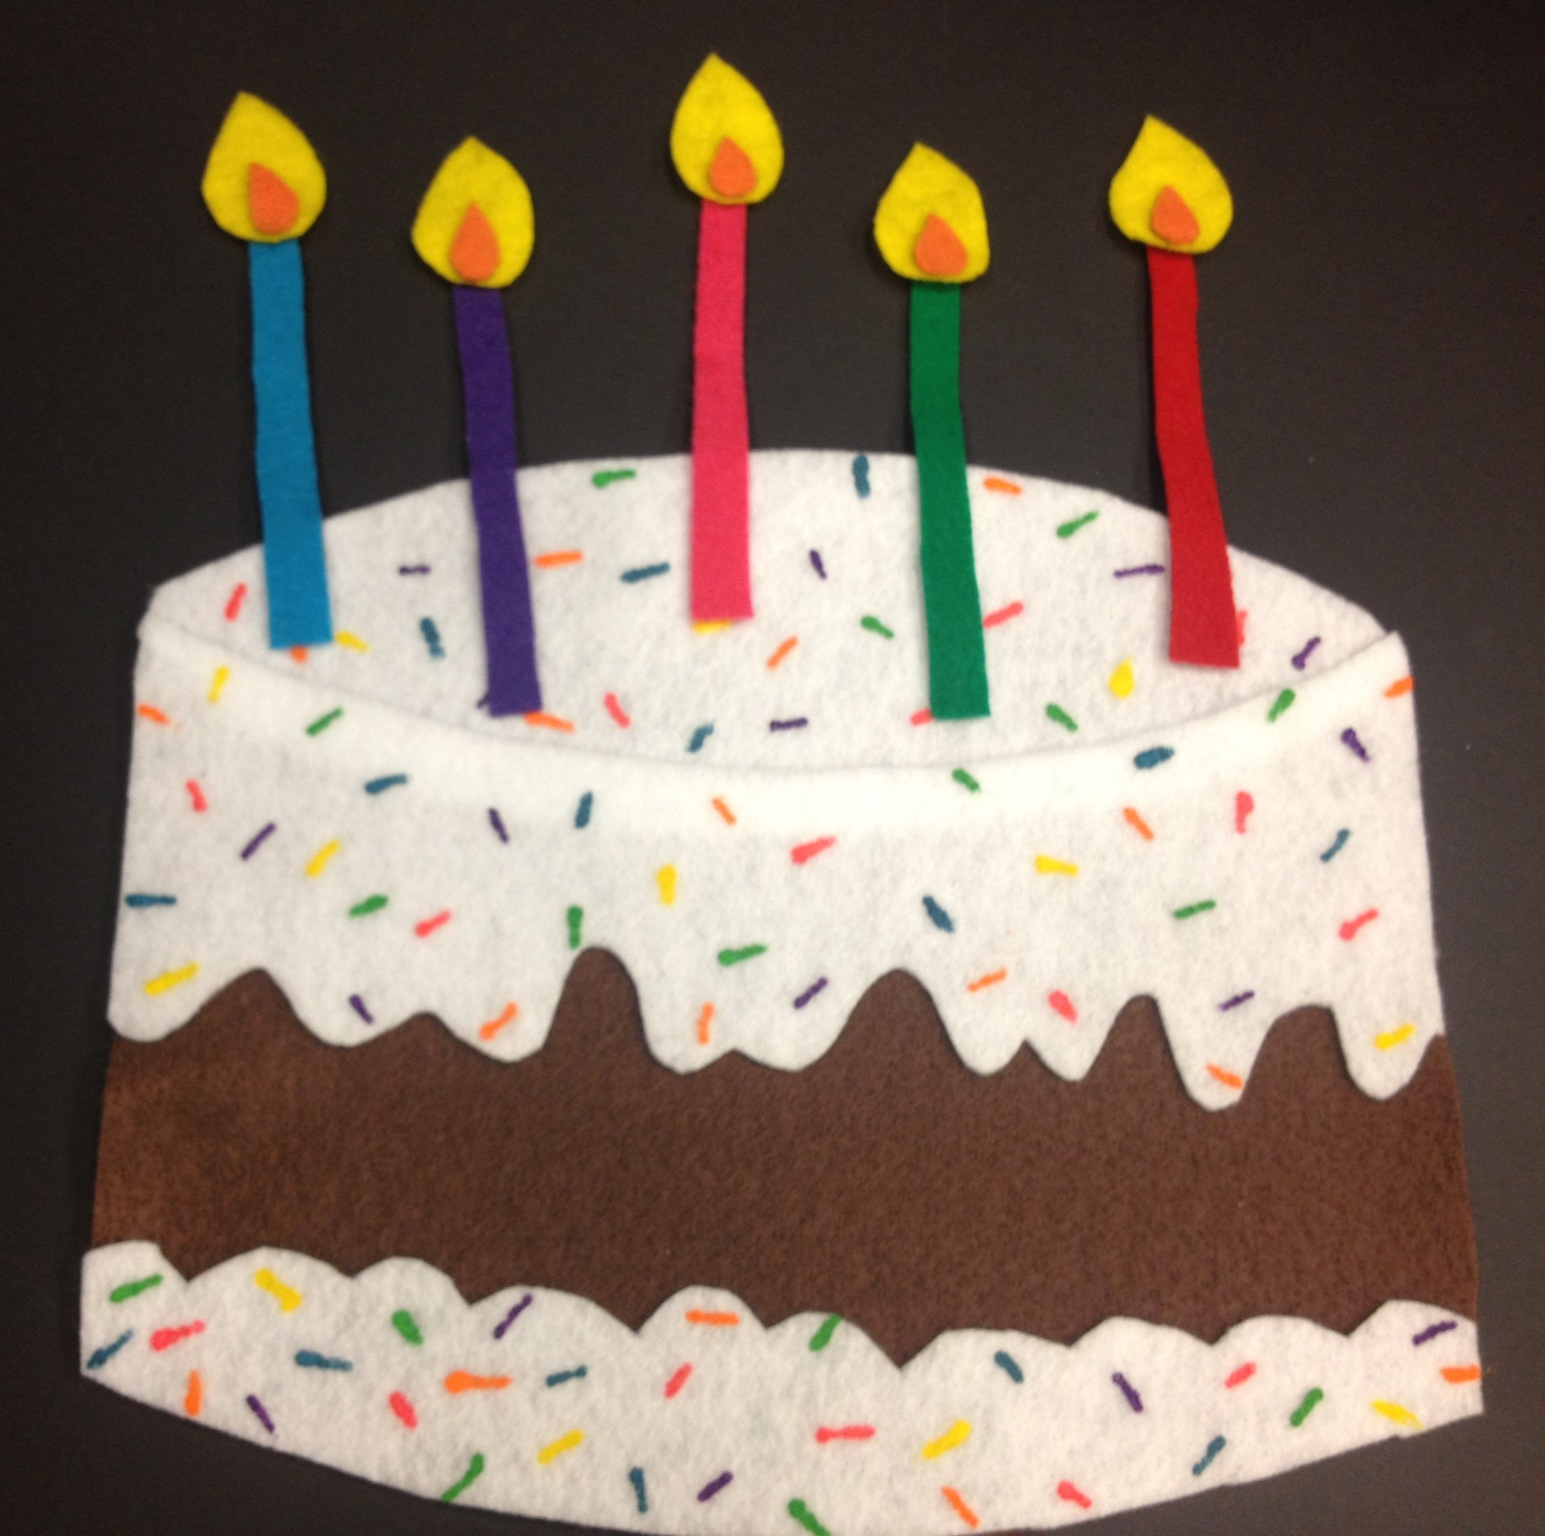 Cupcake And Birthday Cake Craft Idea For Kids